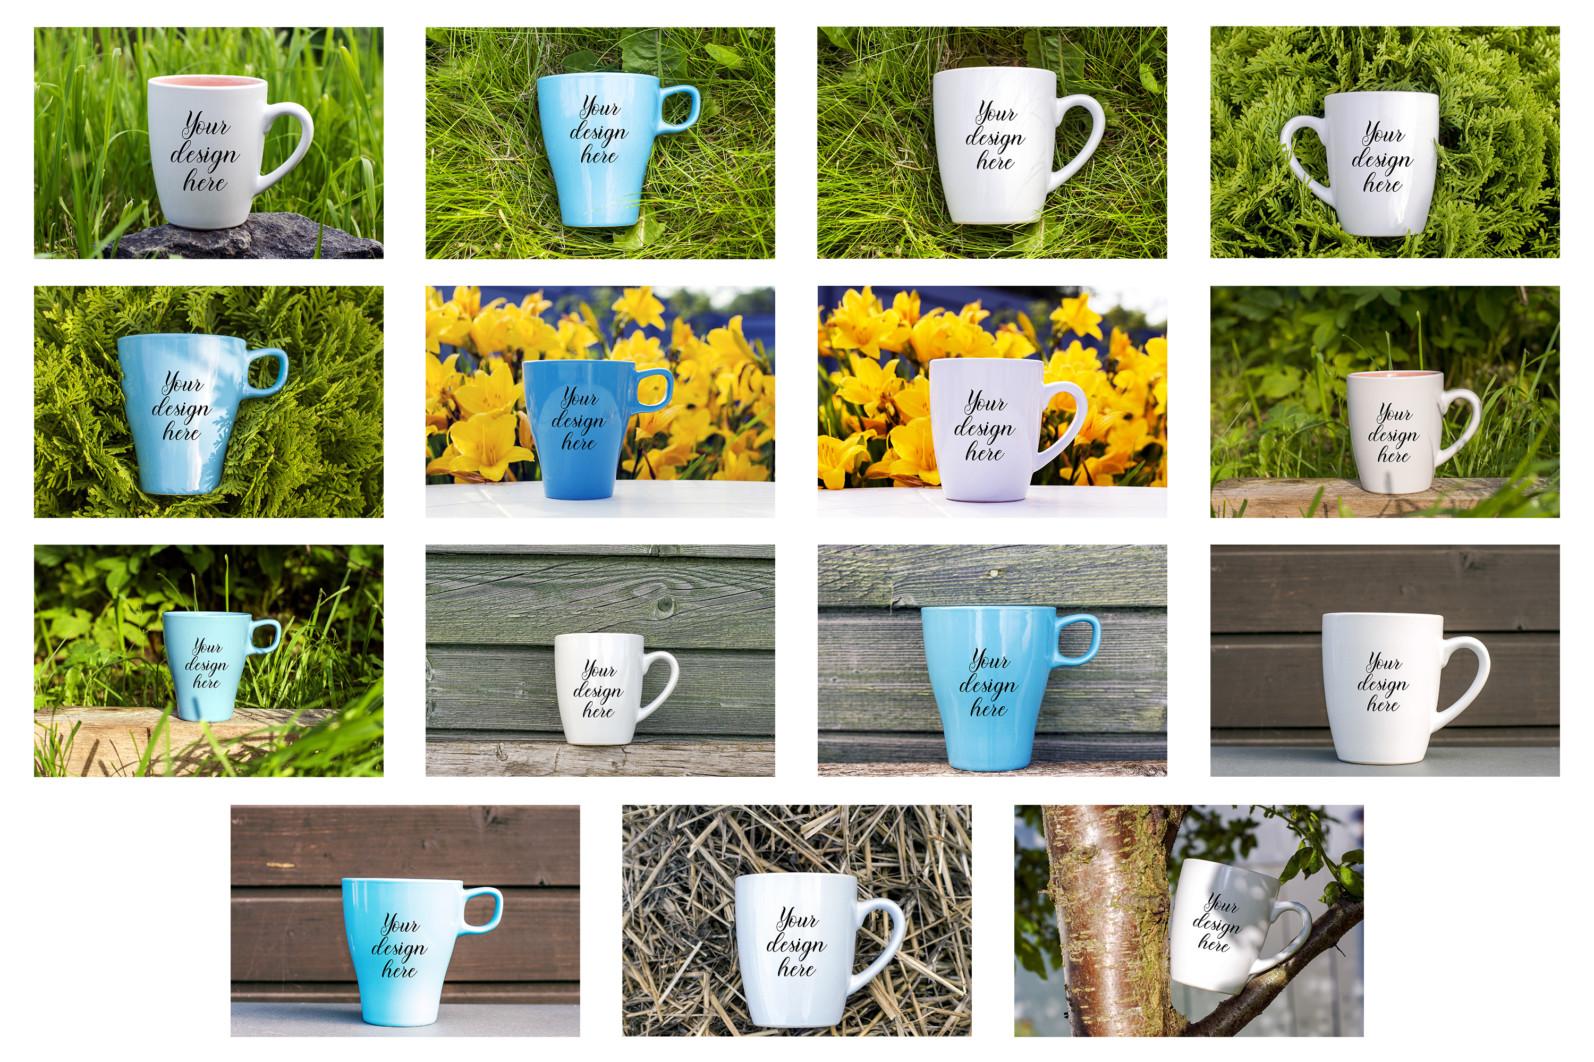 Coffee mug mockup bundle. Mug template bundle. PSD, JPEG files. - 17 24 scaled -